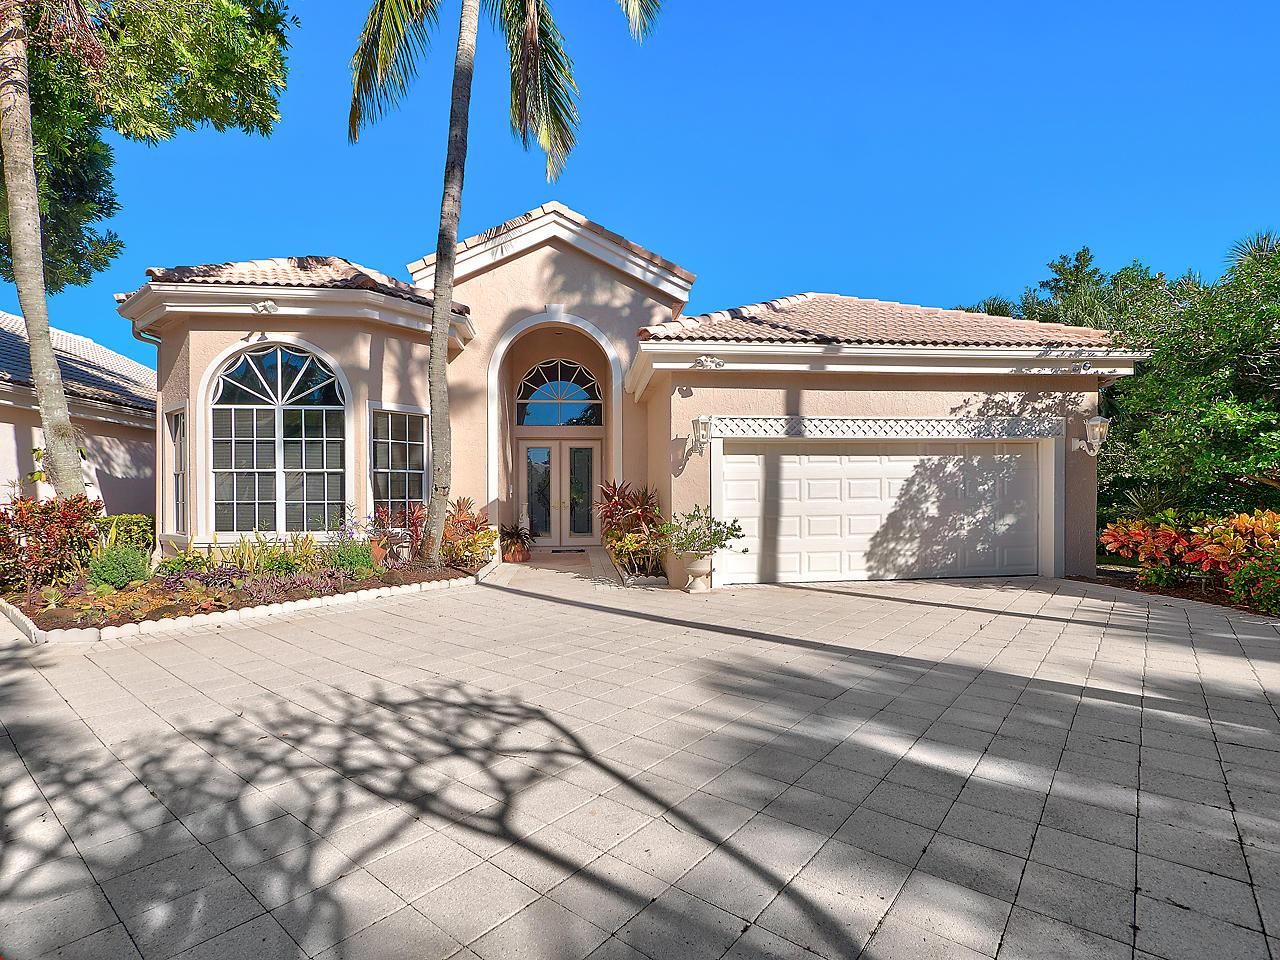 102 Windward Drive Palm Beach Gardens,Florida 33418,3 Bedrooms Bedrooms,4.1 BathroomsBathrooms,A,Windward,RX-10463366